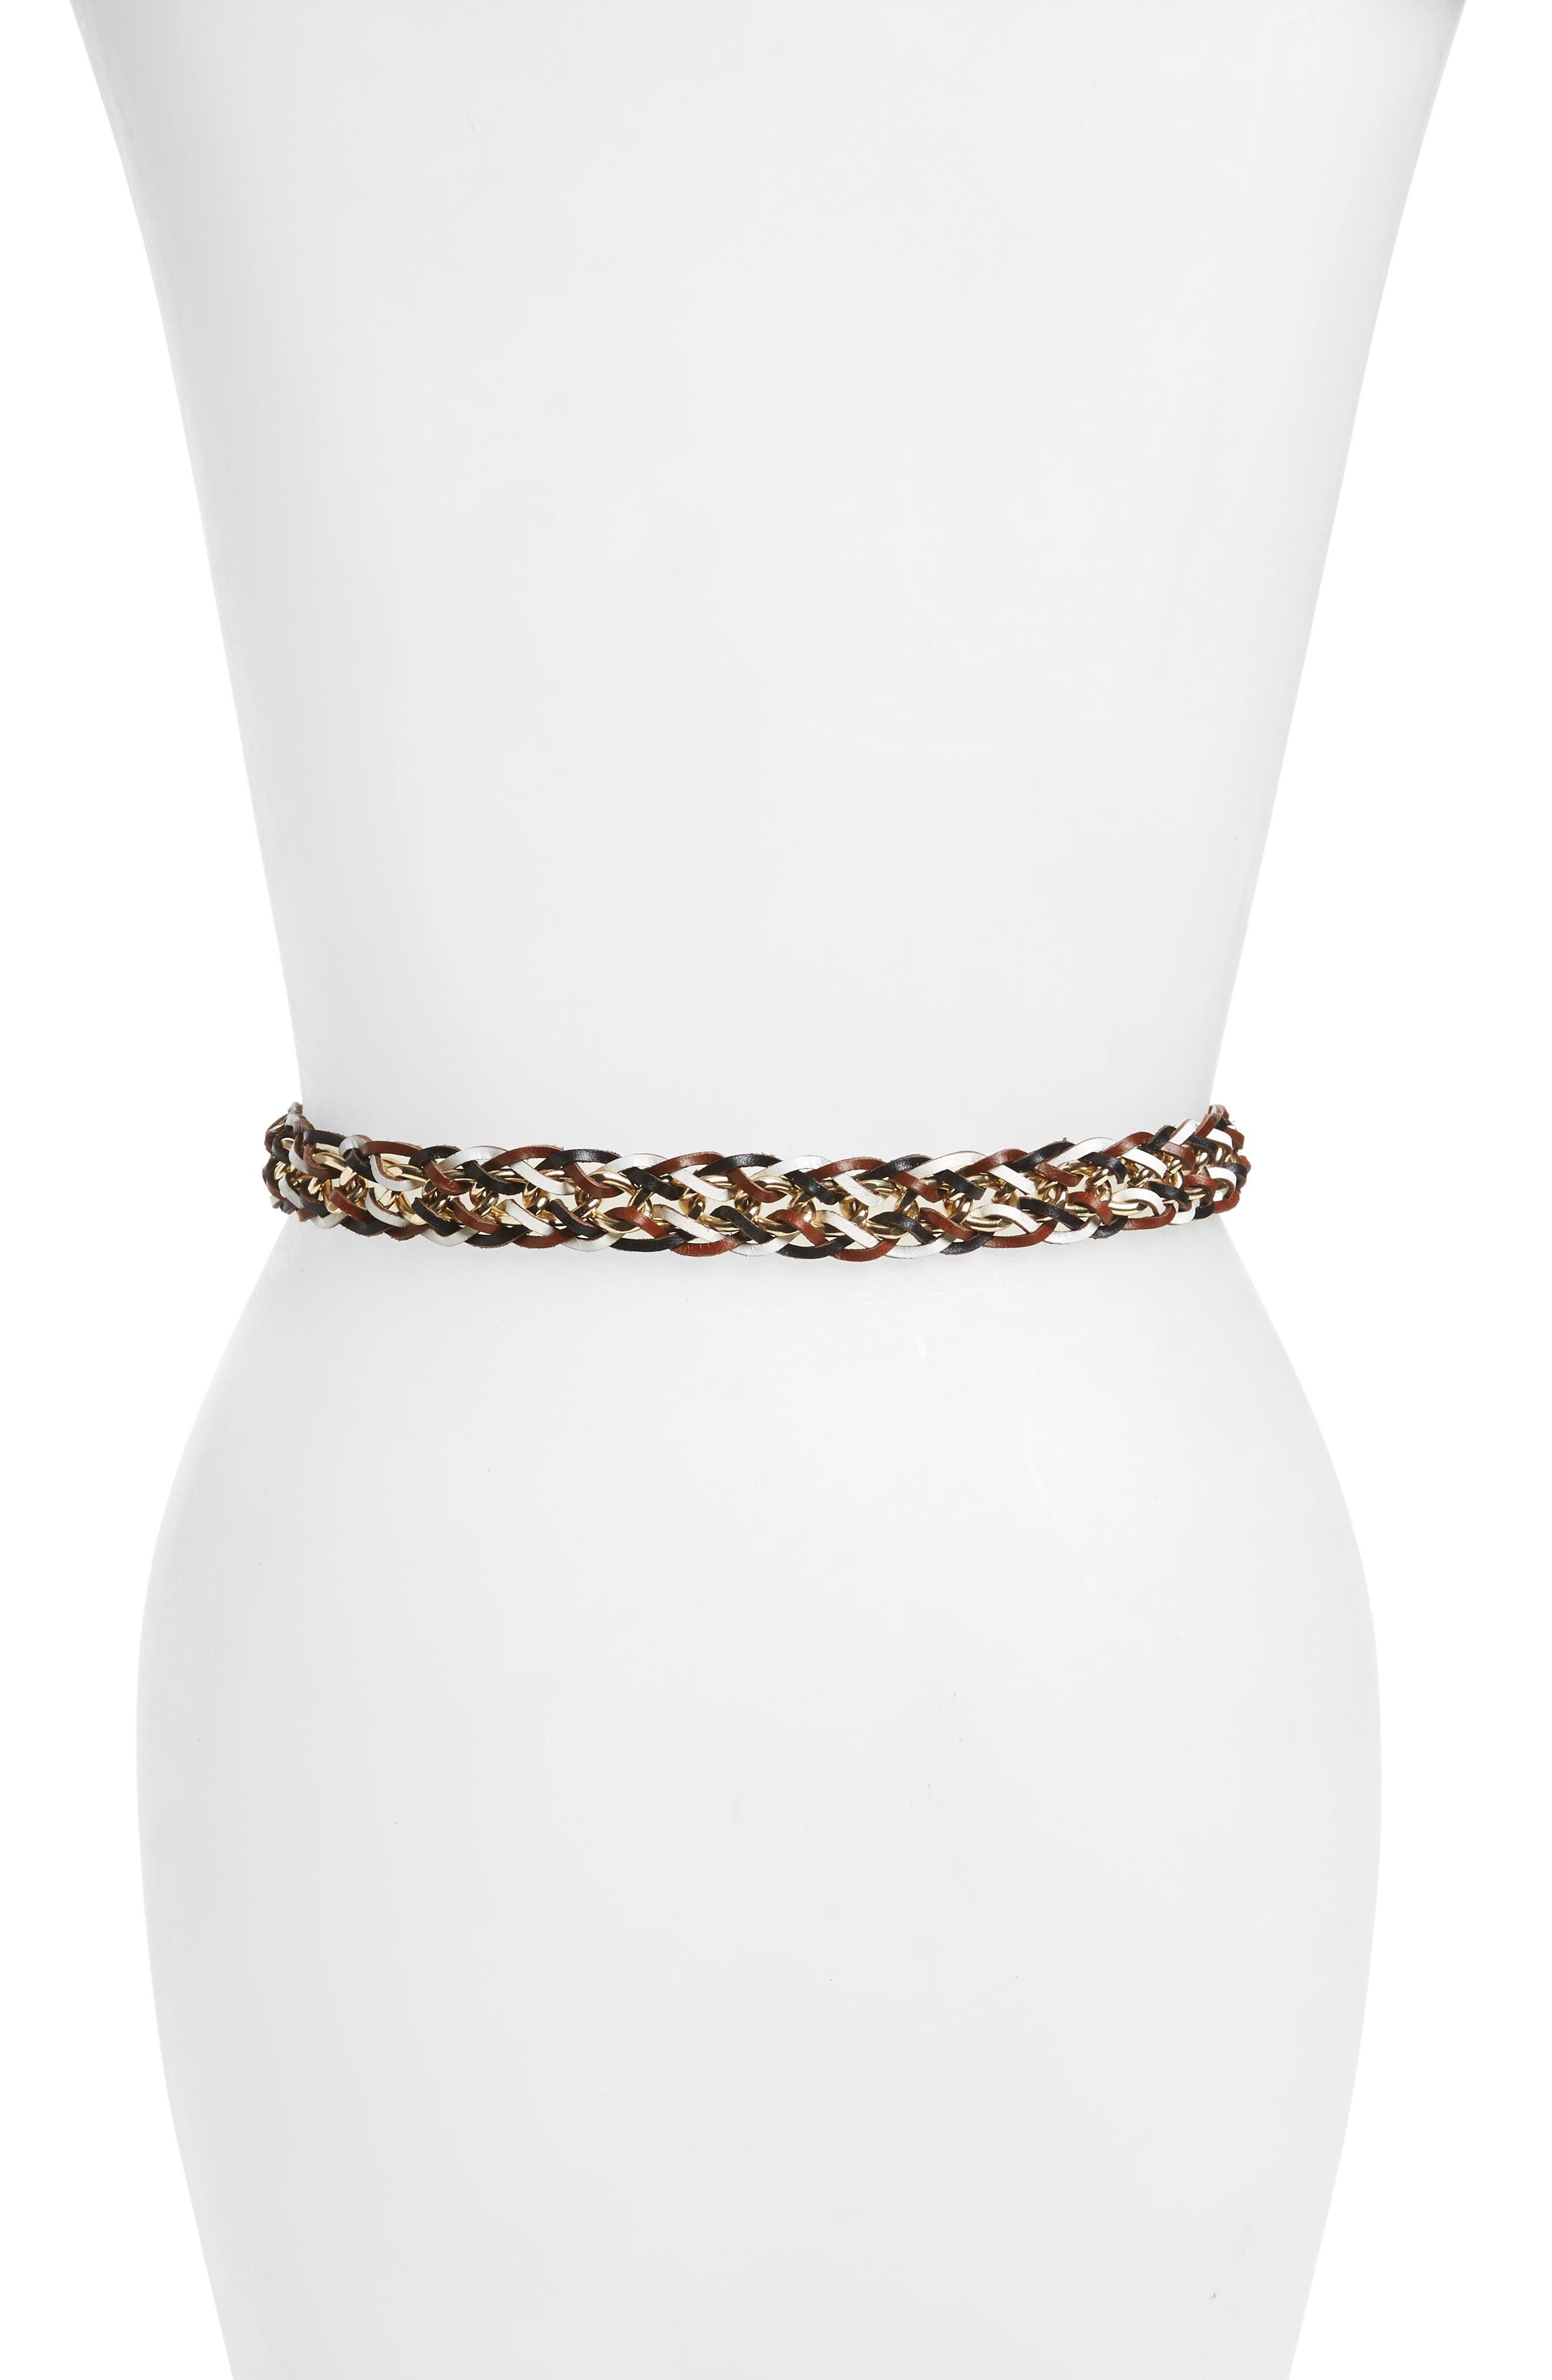 Leather & Chain Belt,                             Alternate thumbnail 2, color,                             Black/White Multi